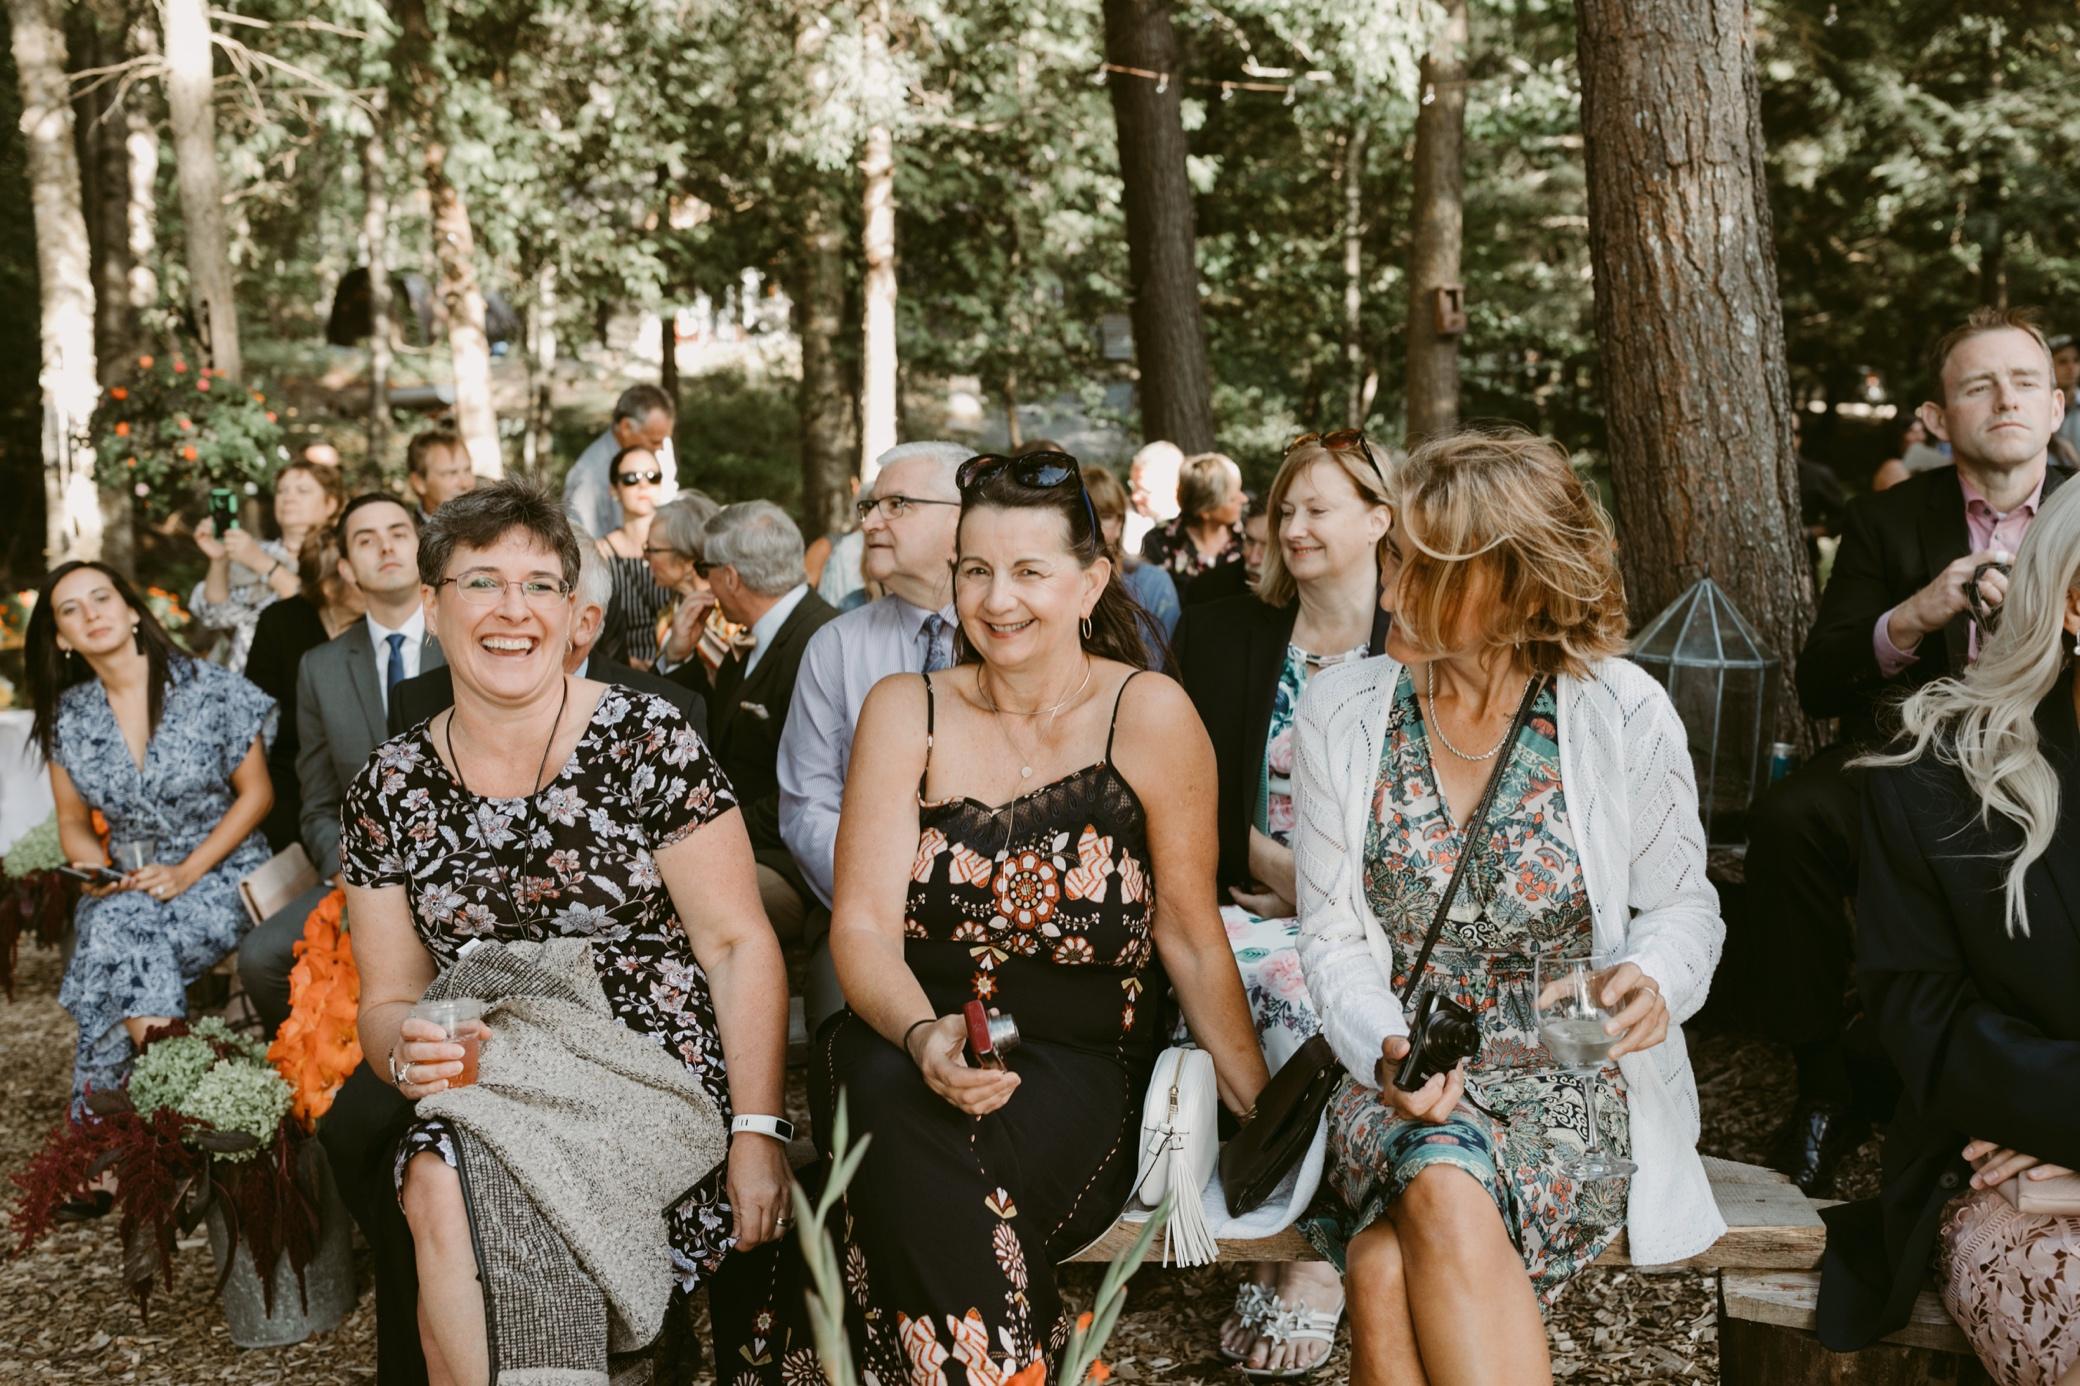 079_Huntsville Wedding  (367 of 689).jpg